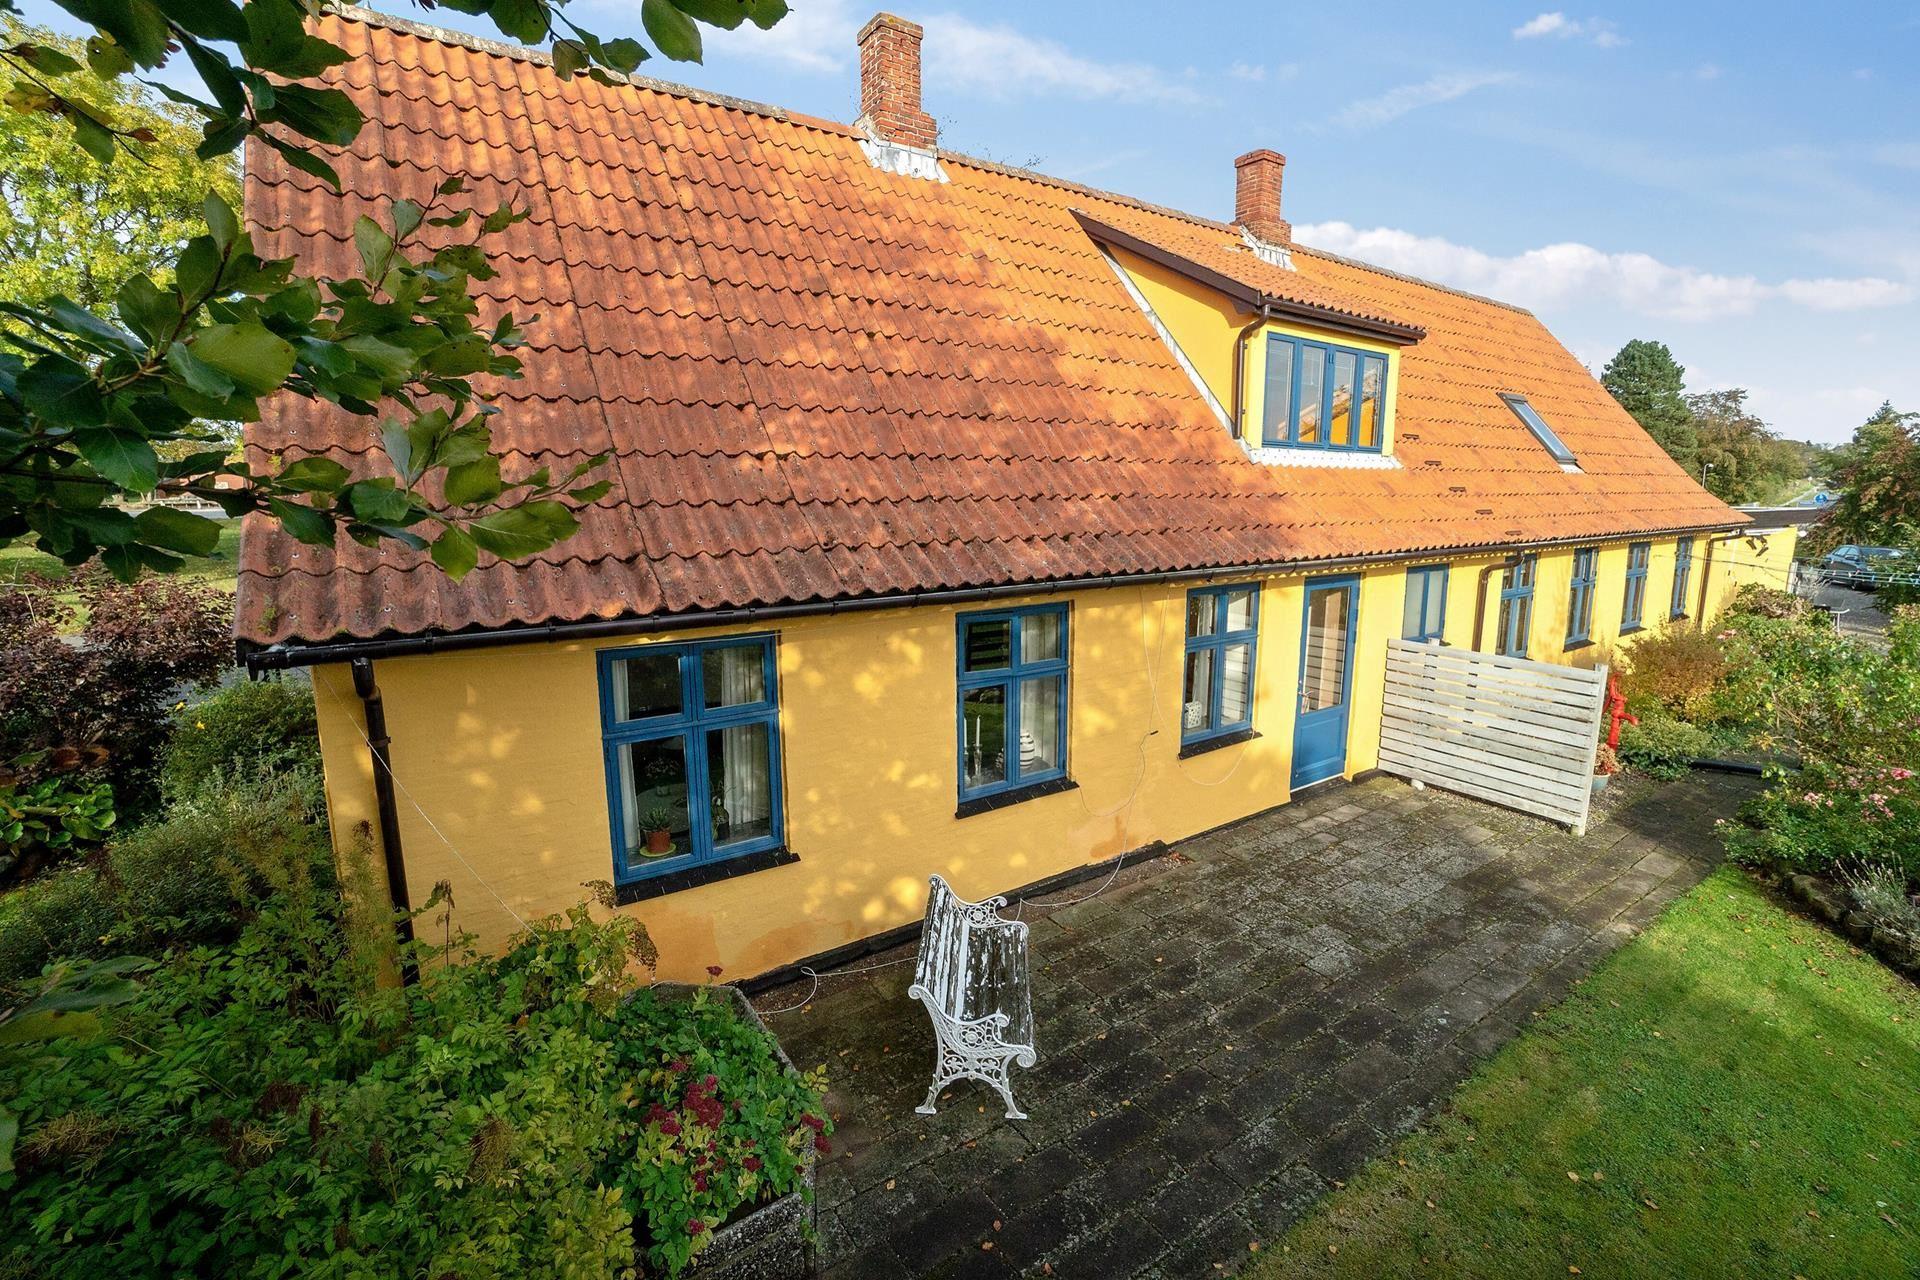 Klintevej 238, Hjertebjerg, 4780 Stege